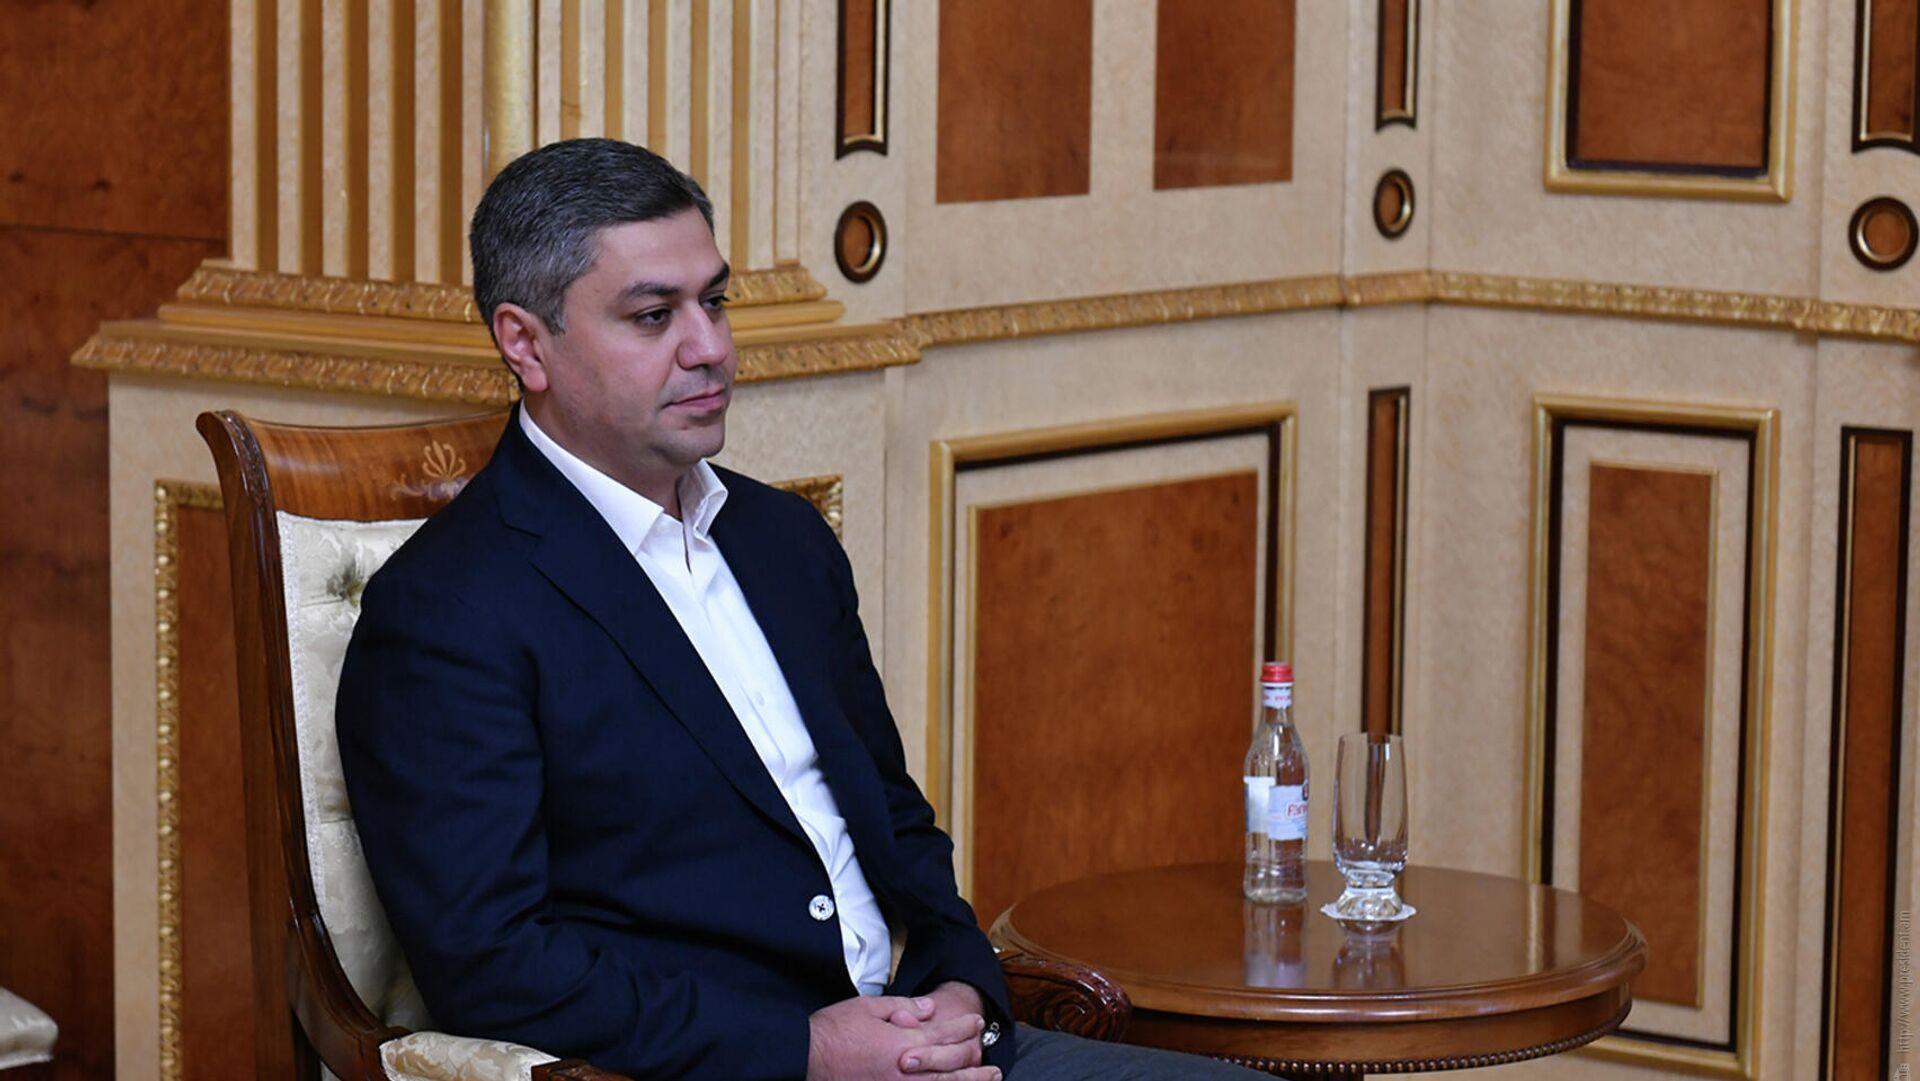 Председатель партии Родина Артур Ванецян во время встречи с президентом Армении - РИА Новости, 1920, 25.11.2020